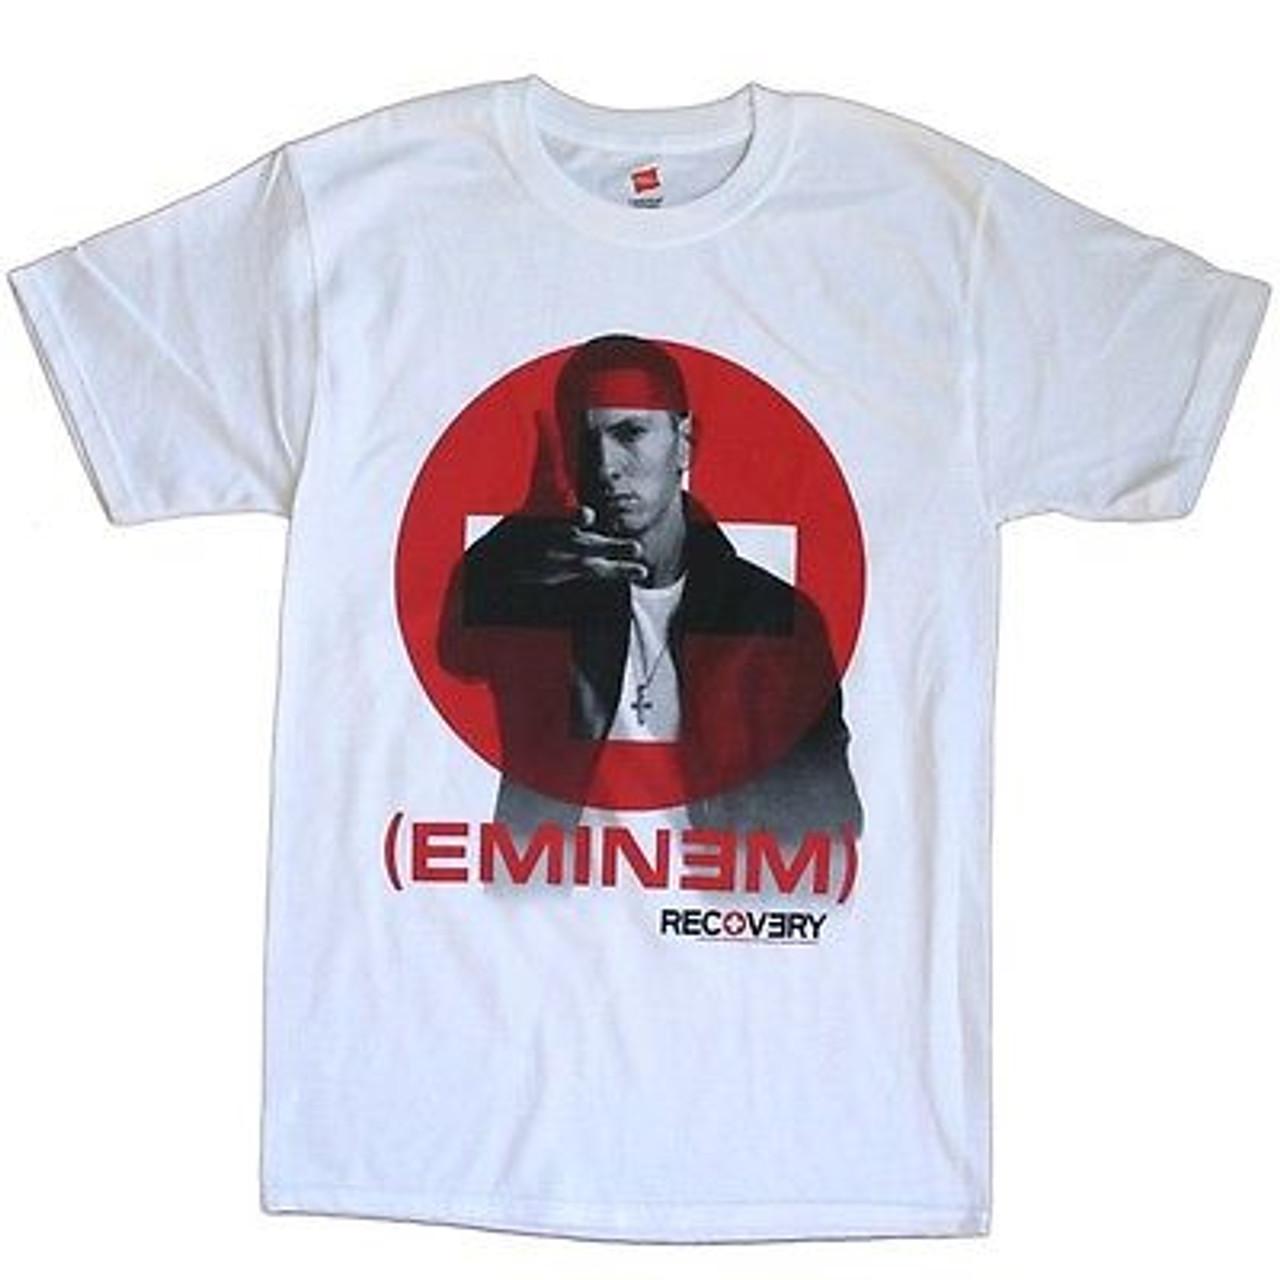 Authentic EMINEM Red Logo Berzerk Slim Shady T-Shirt S M L XL XXL NEW